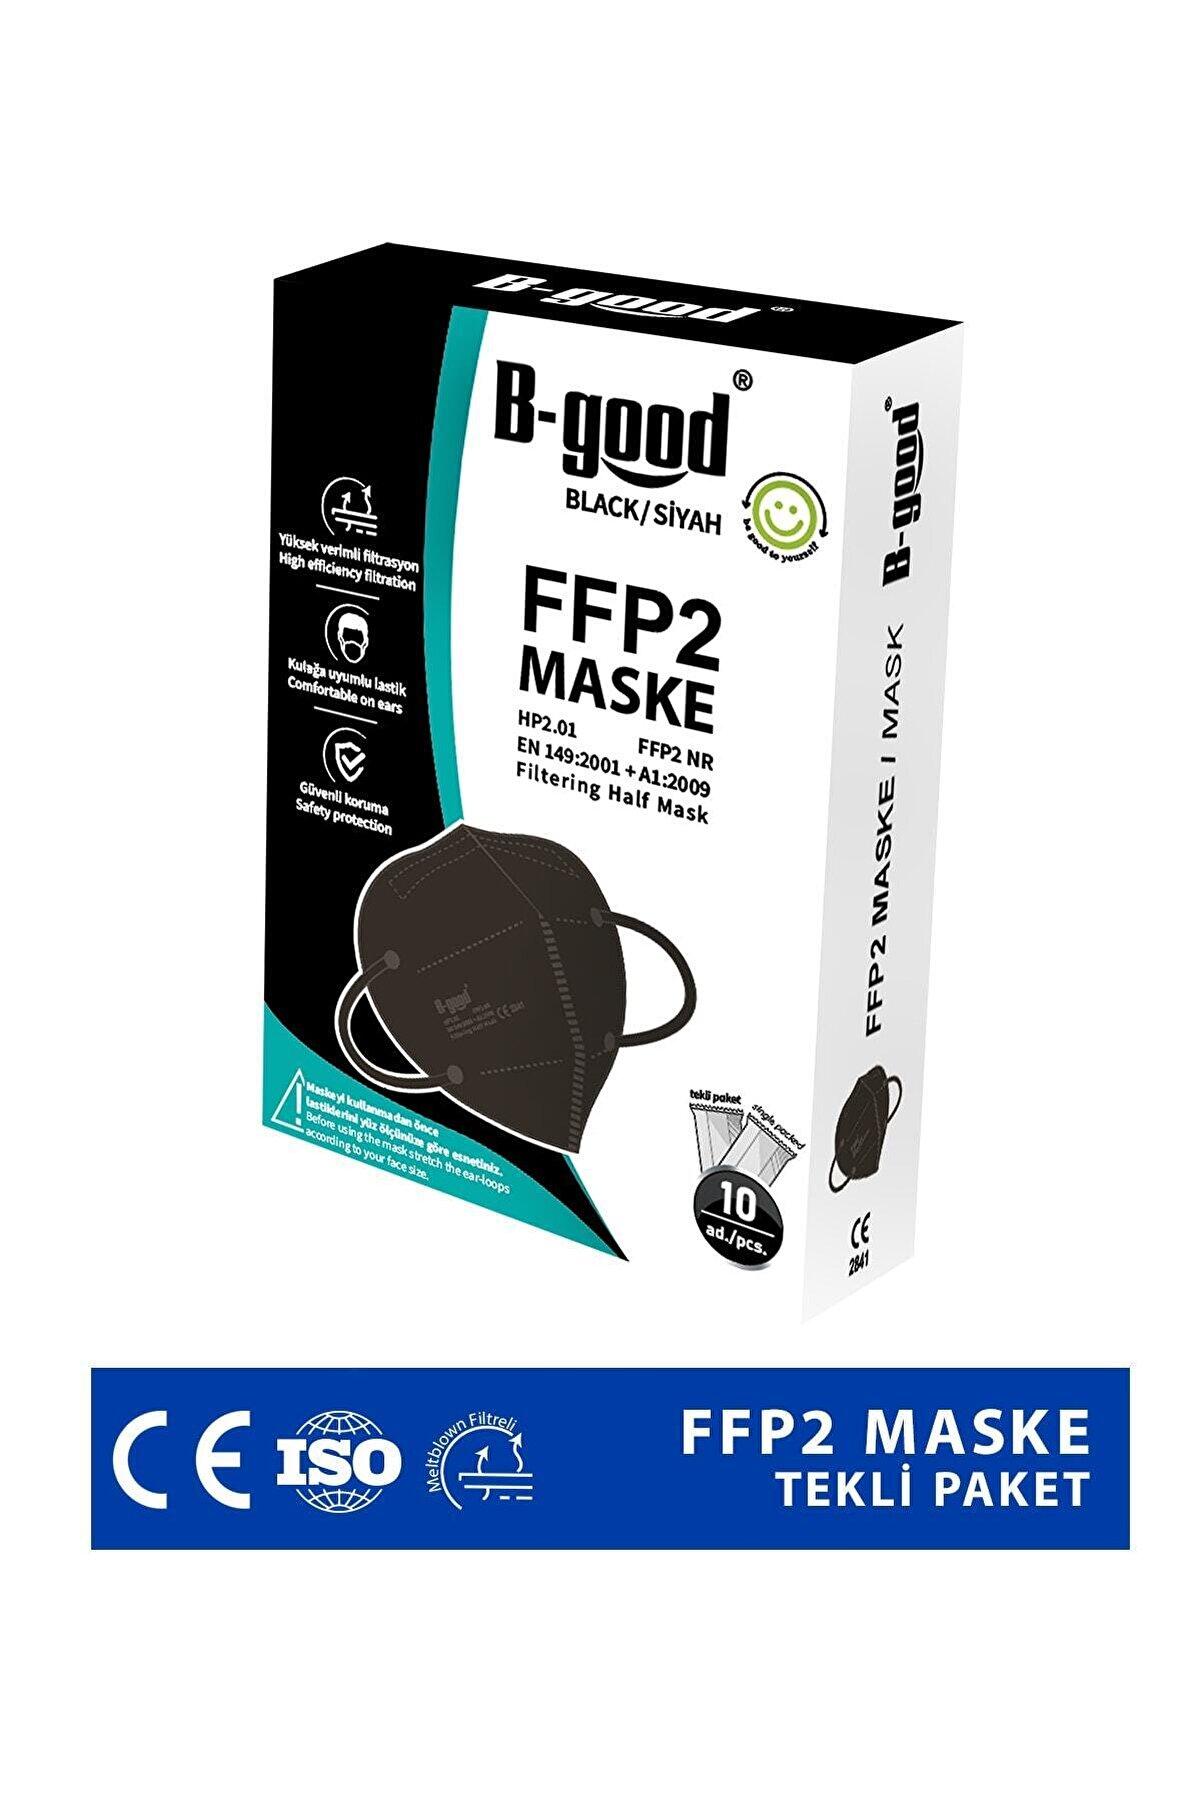 B-GOOD Ffp2 Tekli Paketlenmiş Siyah Koruyucu Maske 10'lu